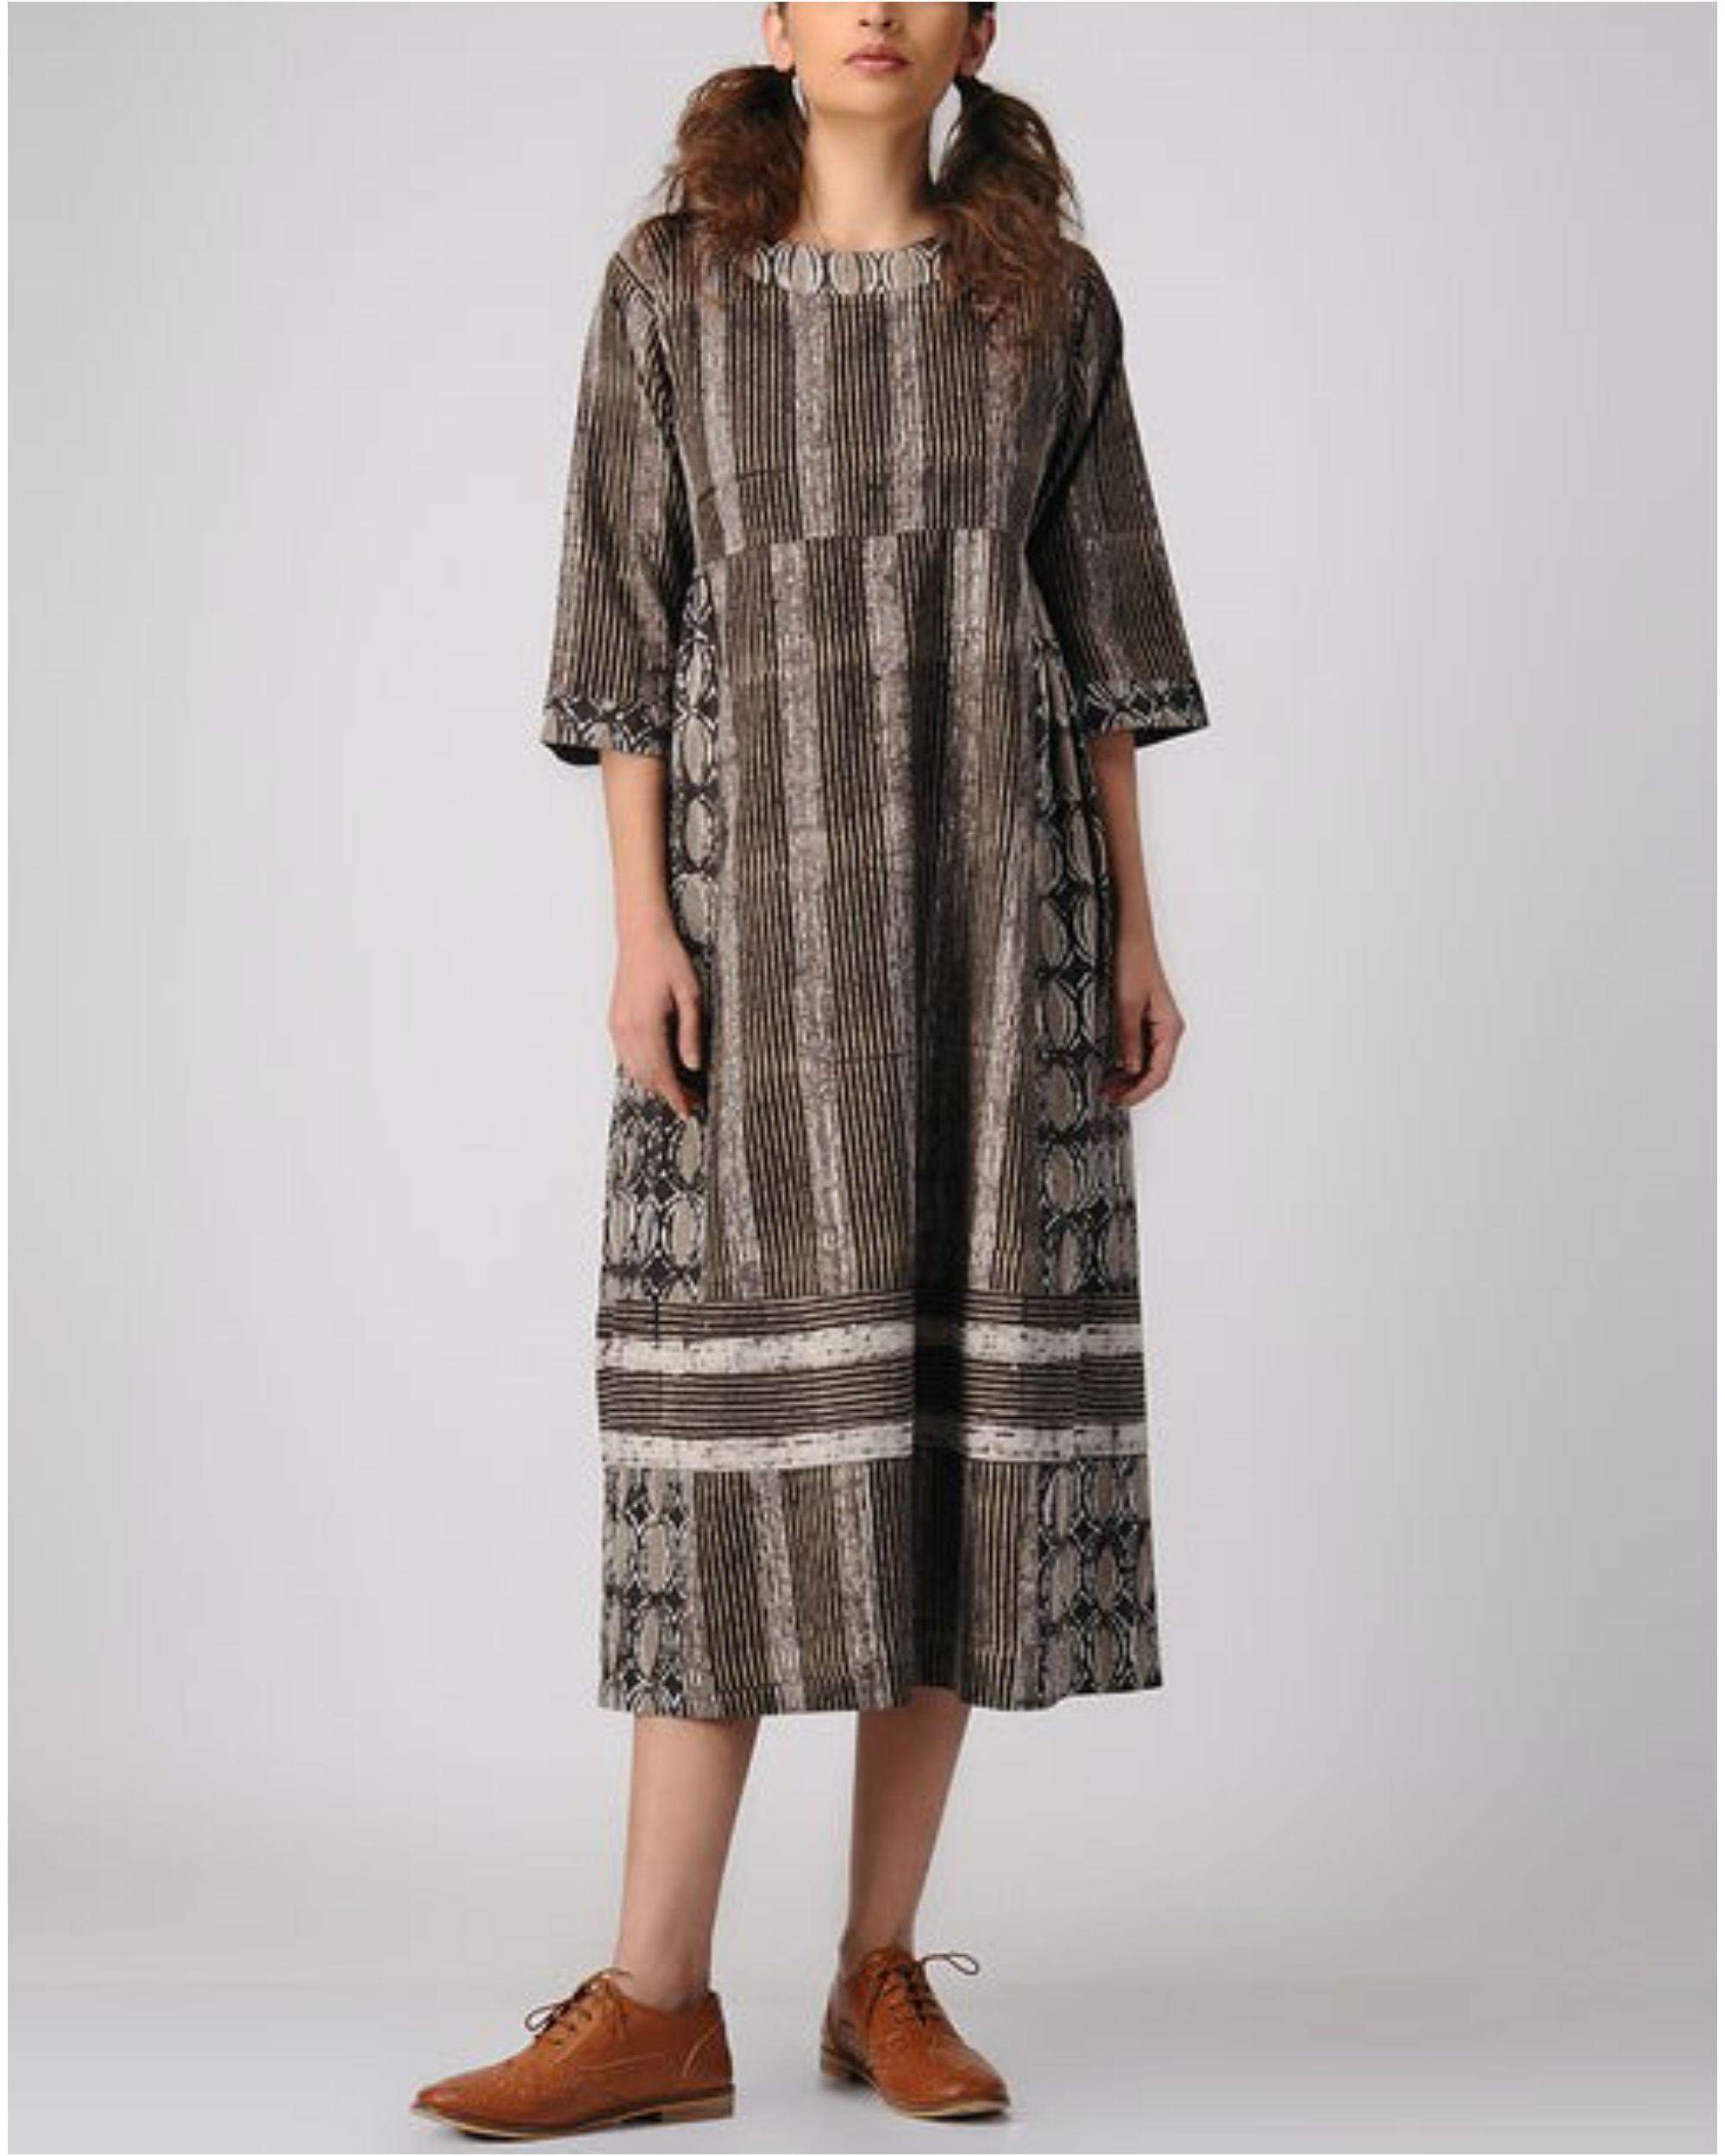 Shades of wood dress